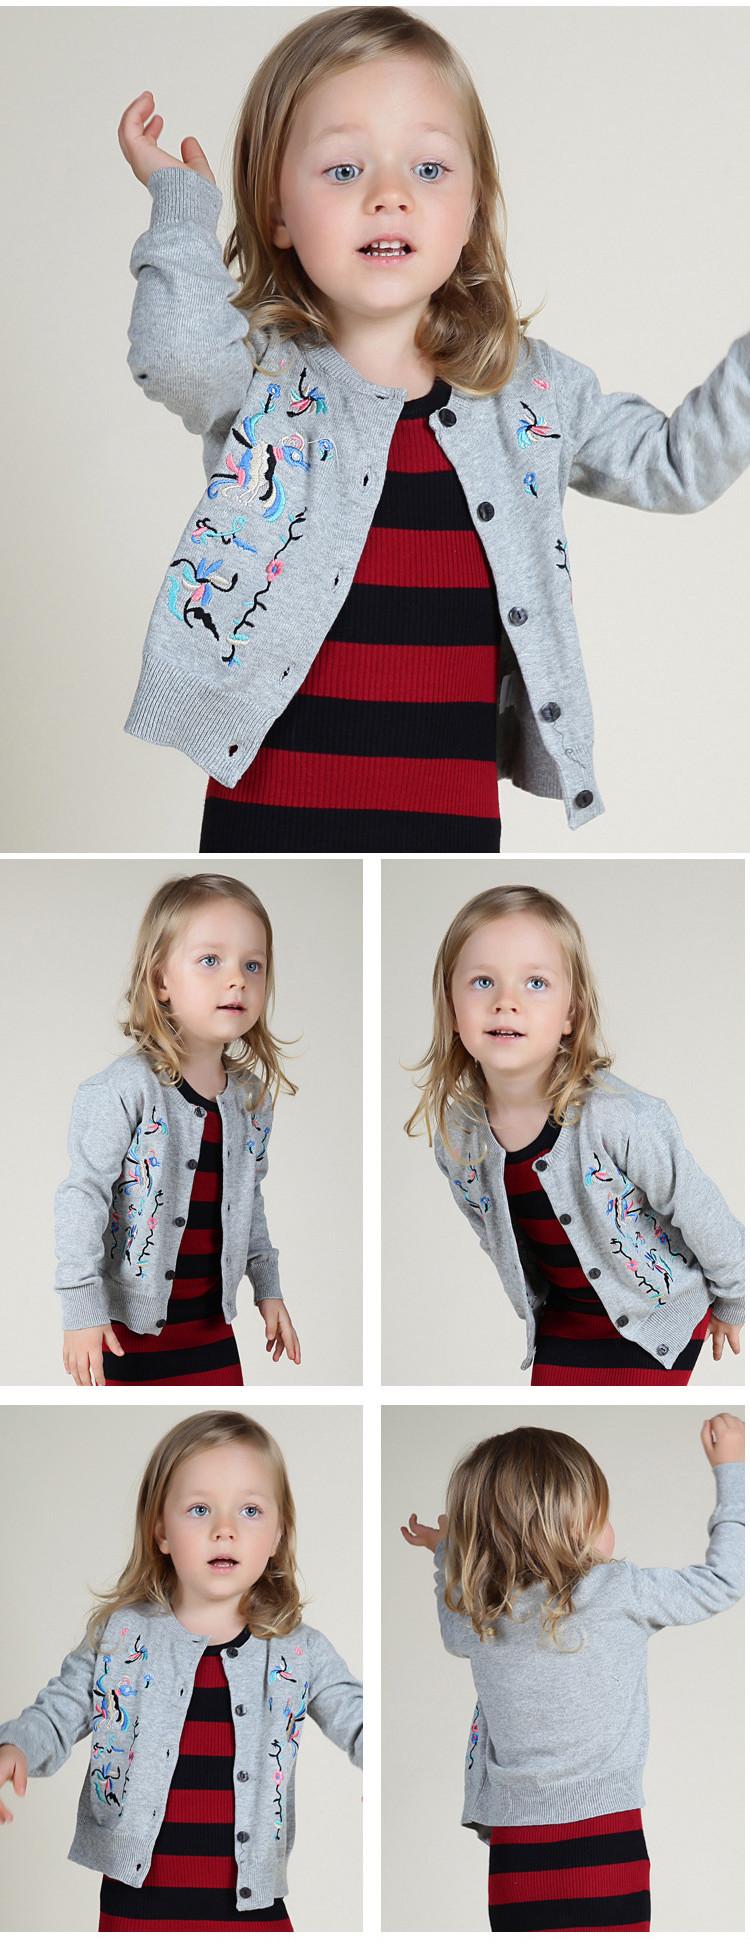 girls clothing-2